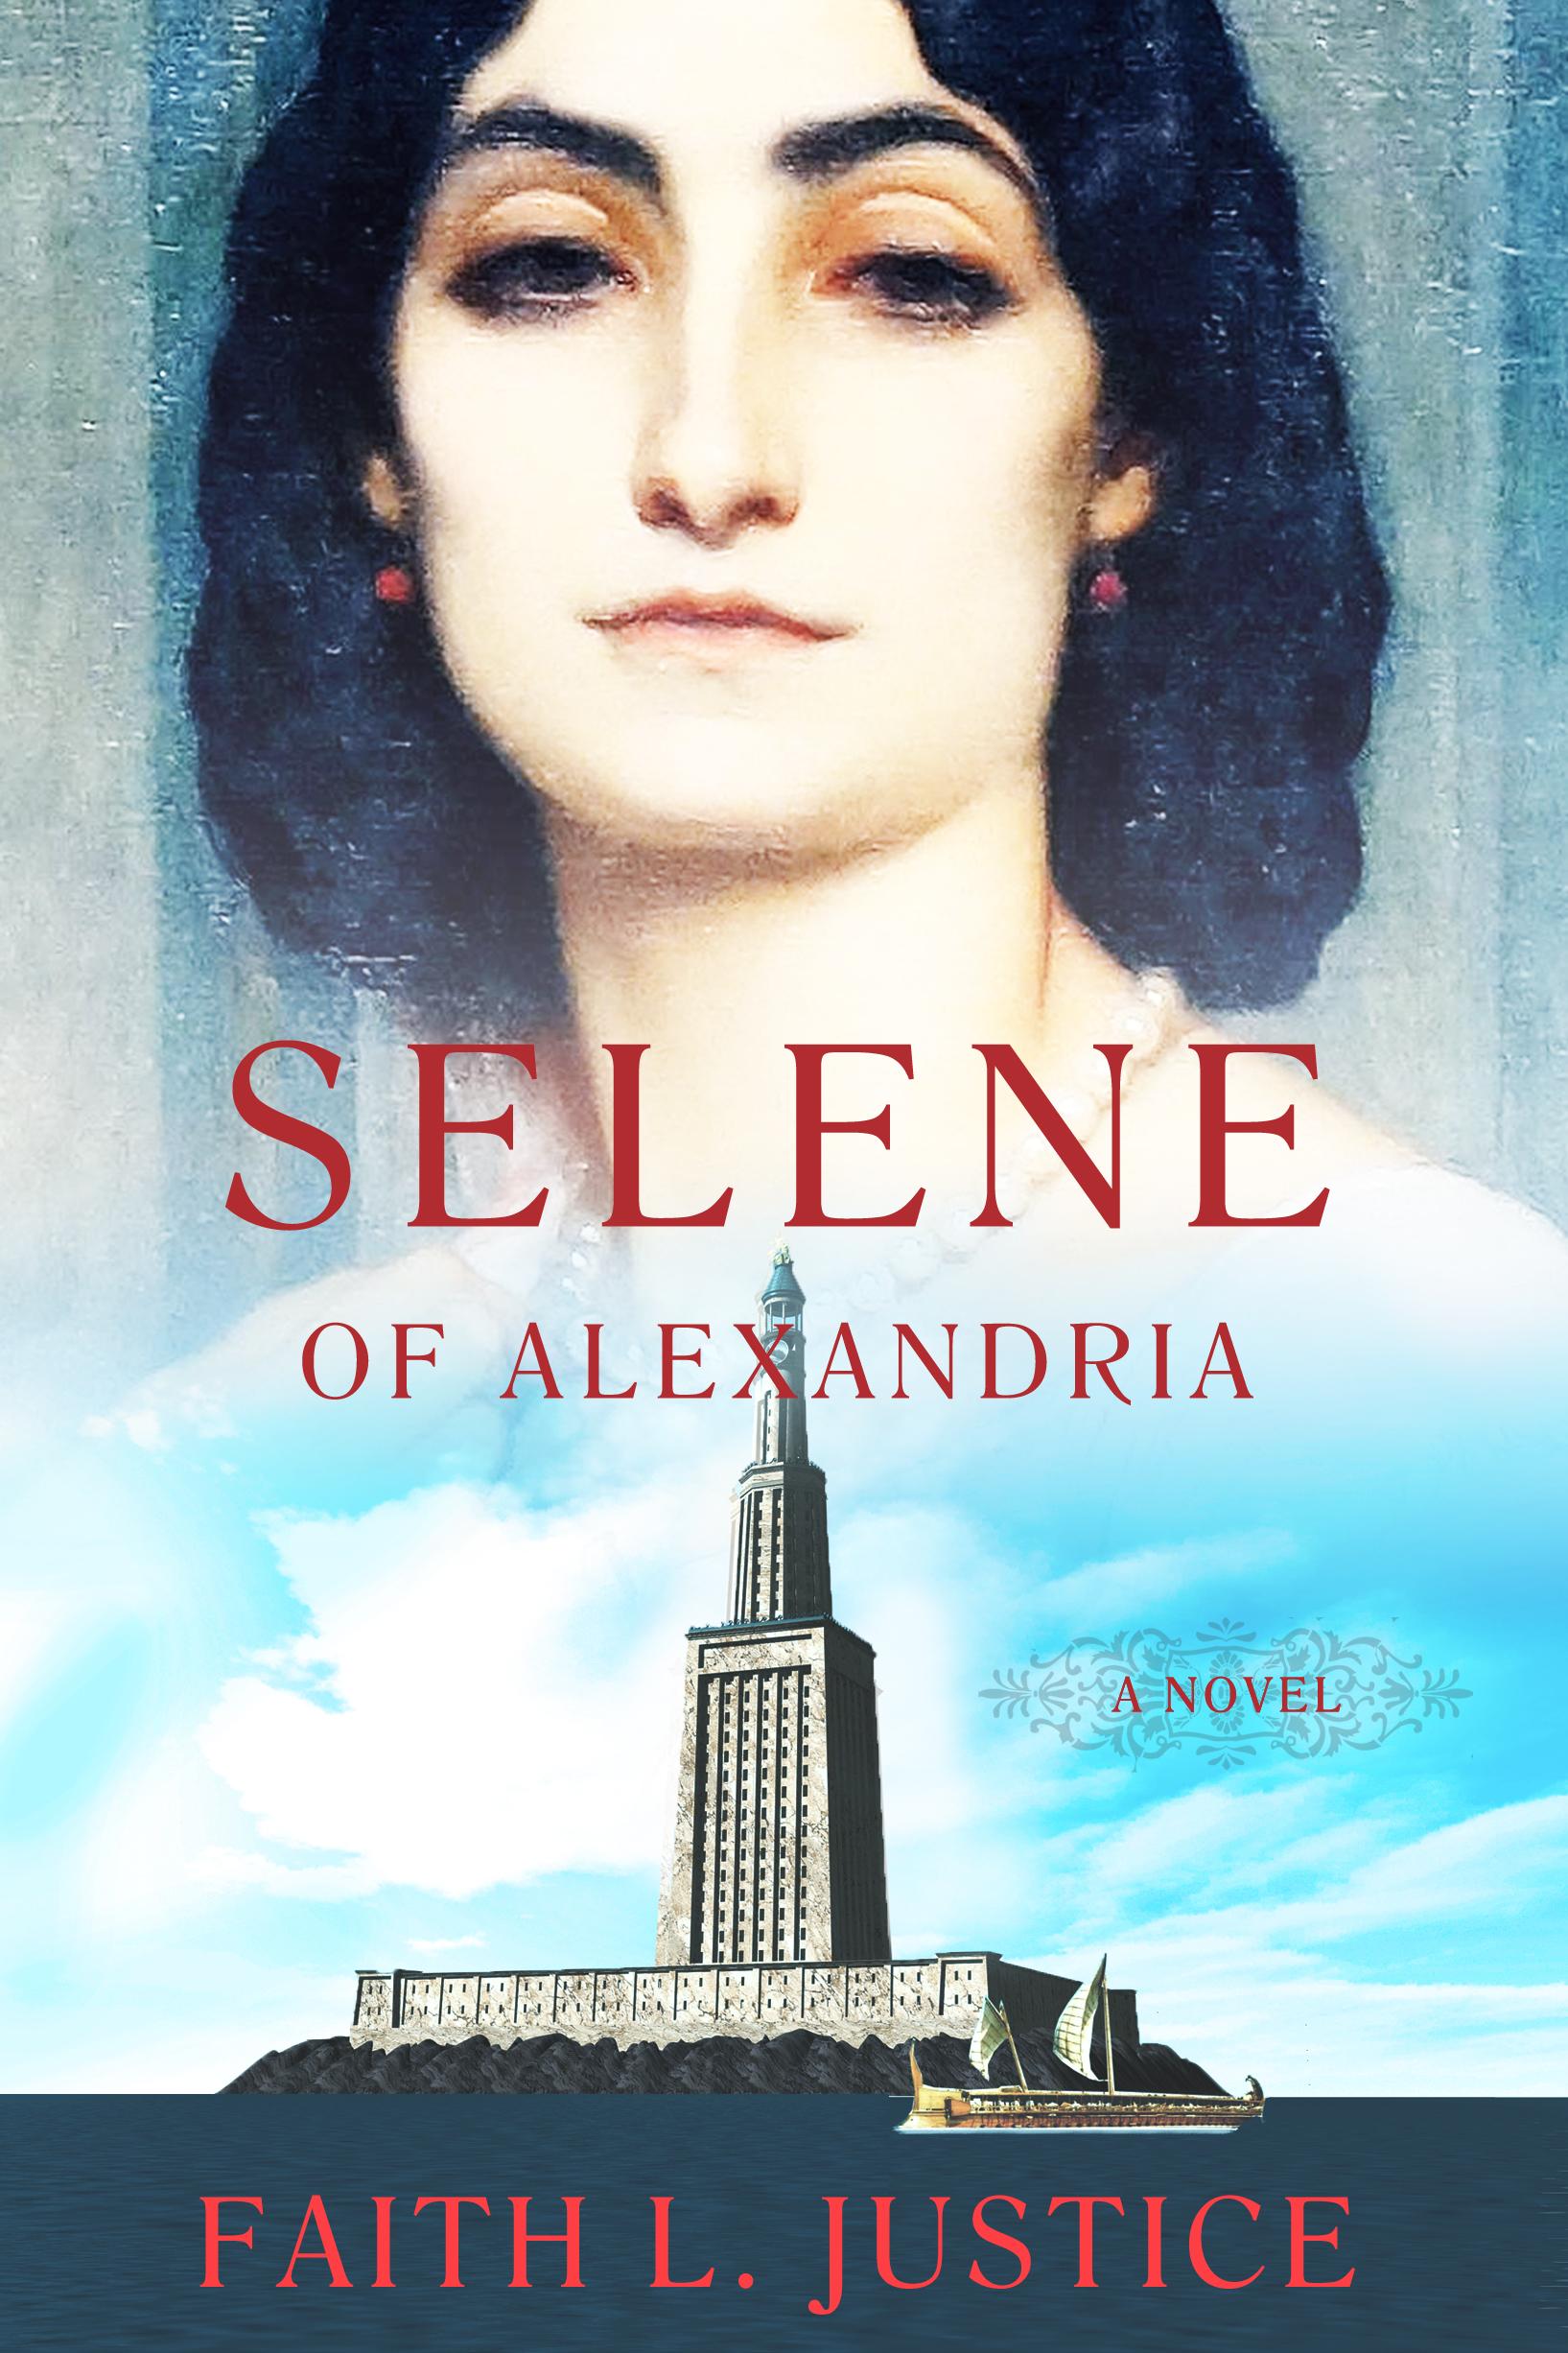 Selene of Alexandria 10th anniversarycover